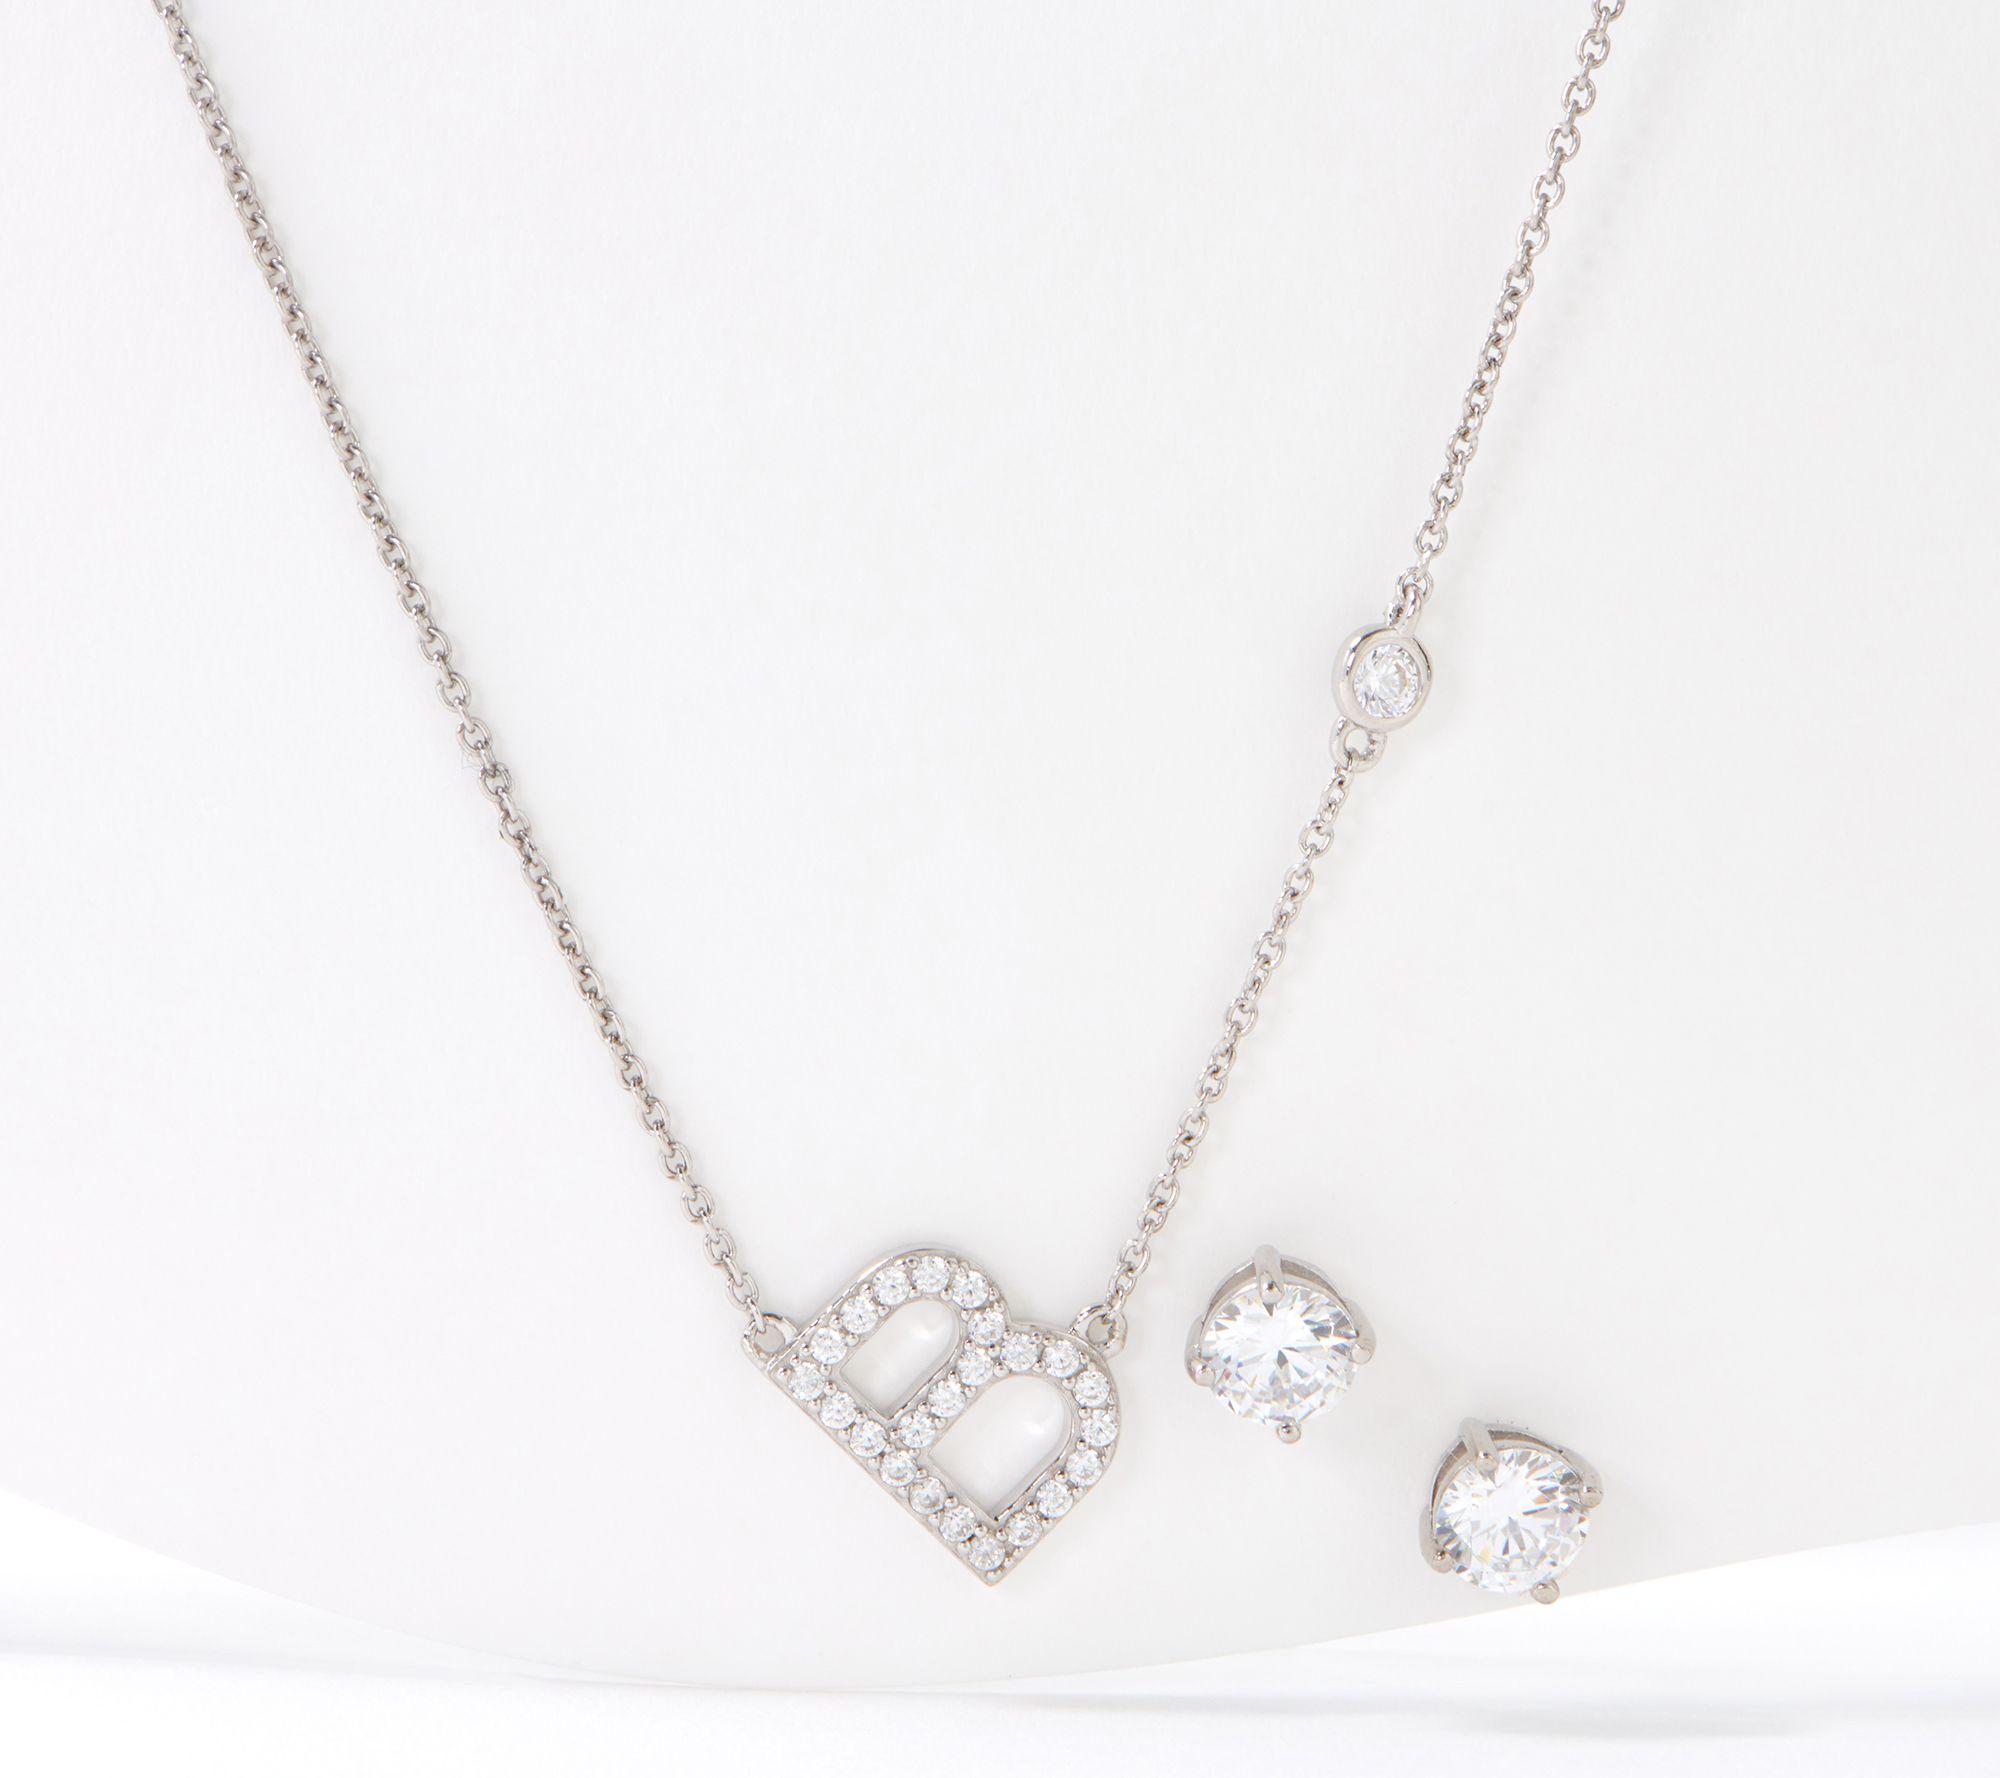 Diamonique Bitty Initial Necklace & Studs Set, Platinum Clad